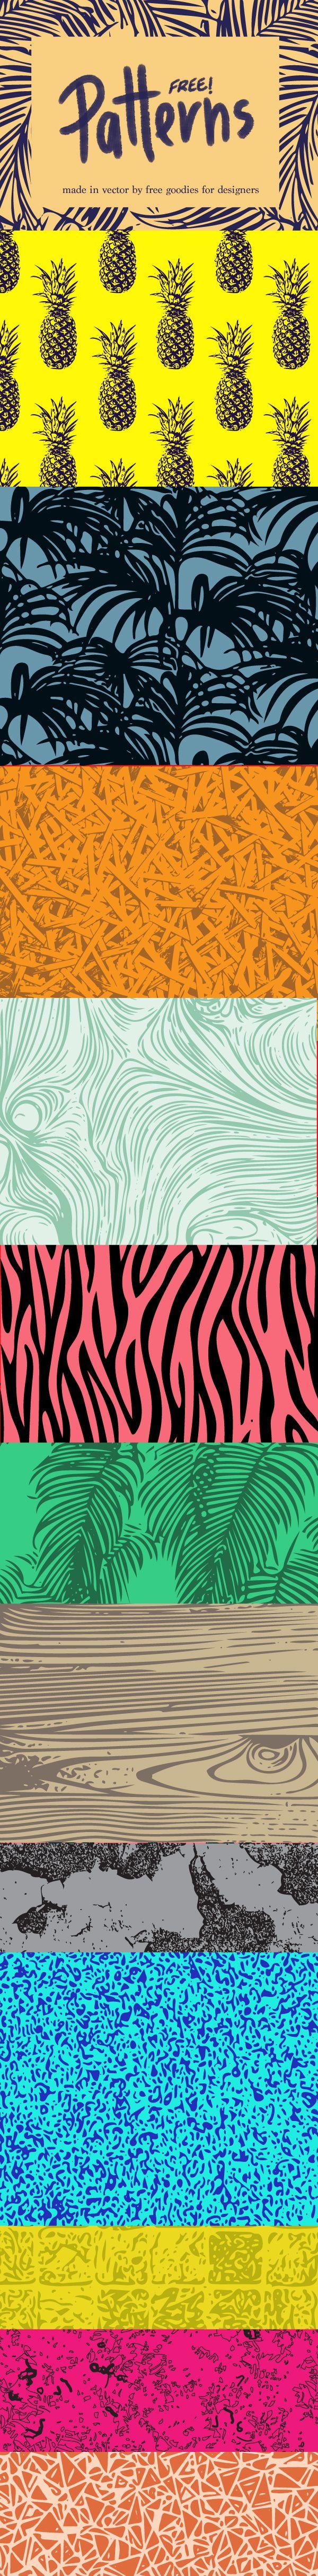 Download free 15 amazing vector patterns here :http://freegoodiesfordesigners.blogspot.se/2015/04/15-free-fresh-colorful-patterns.html #freegoodiesfordesigners